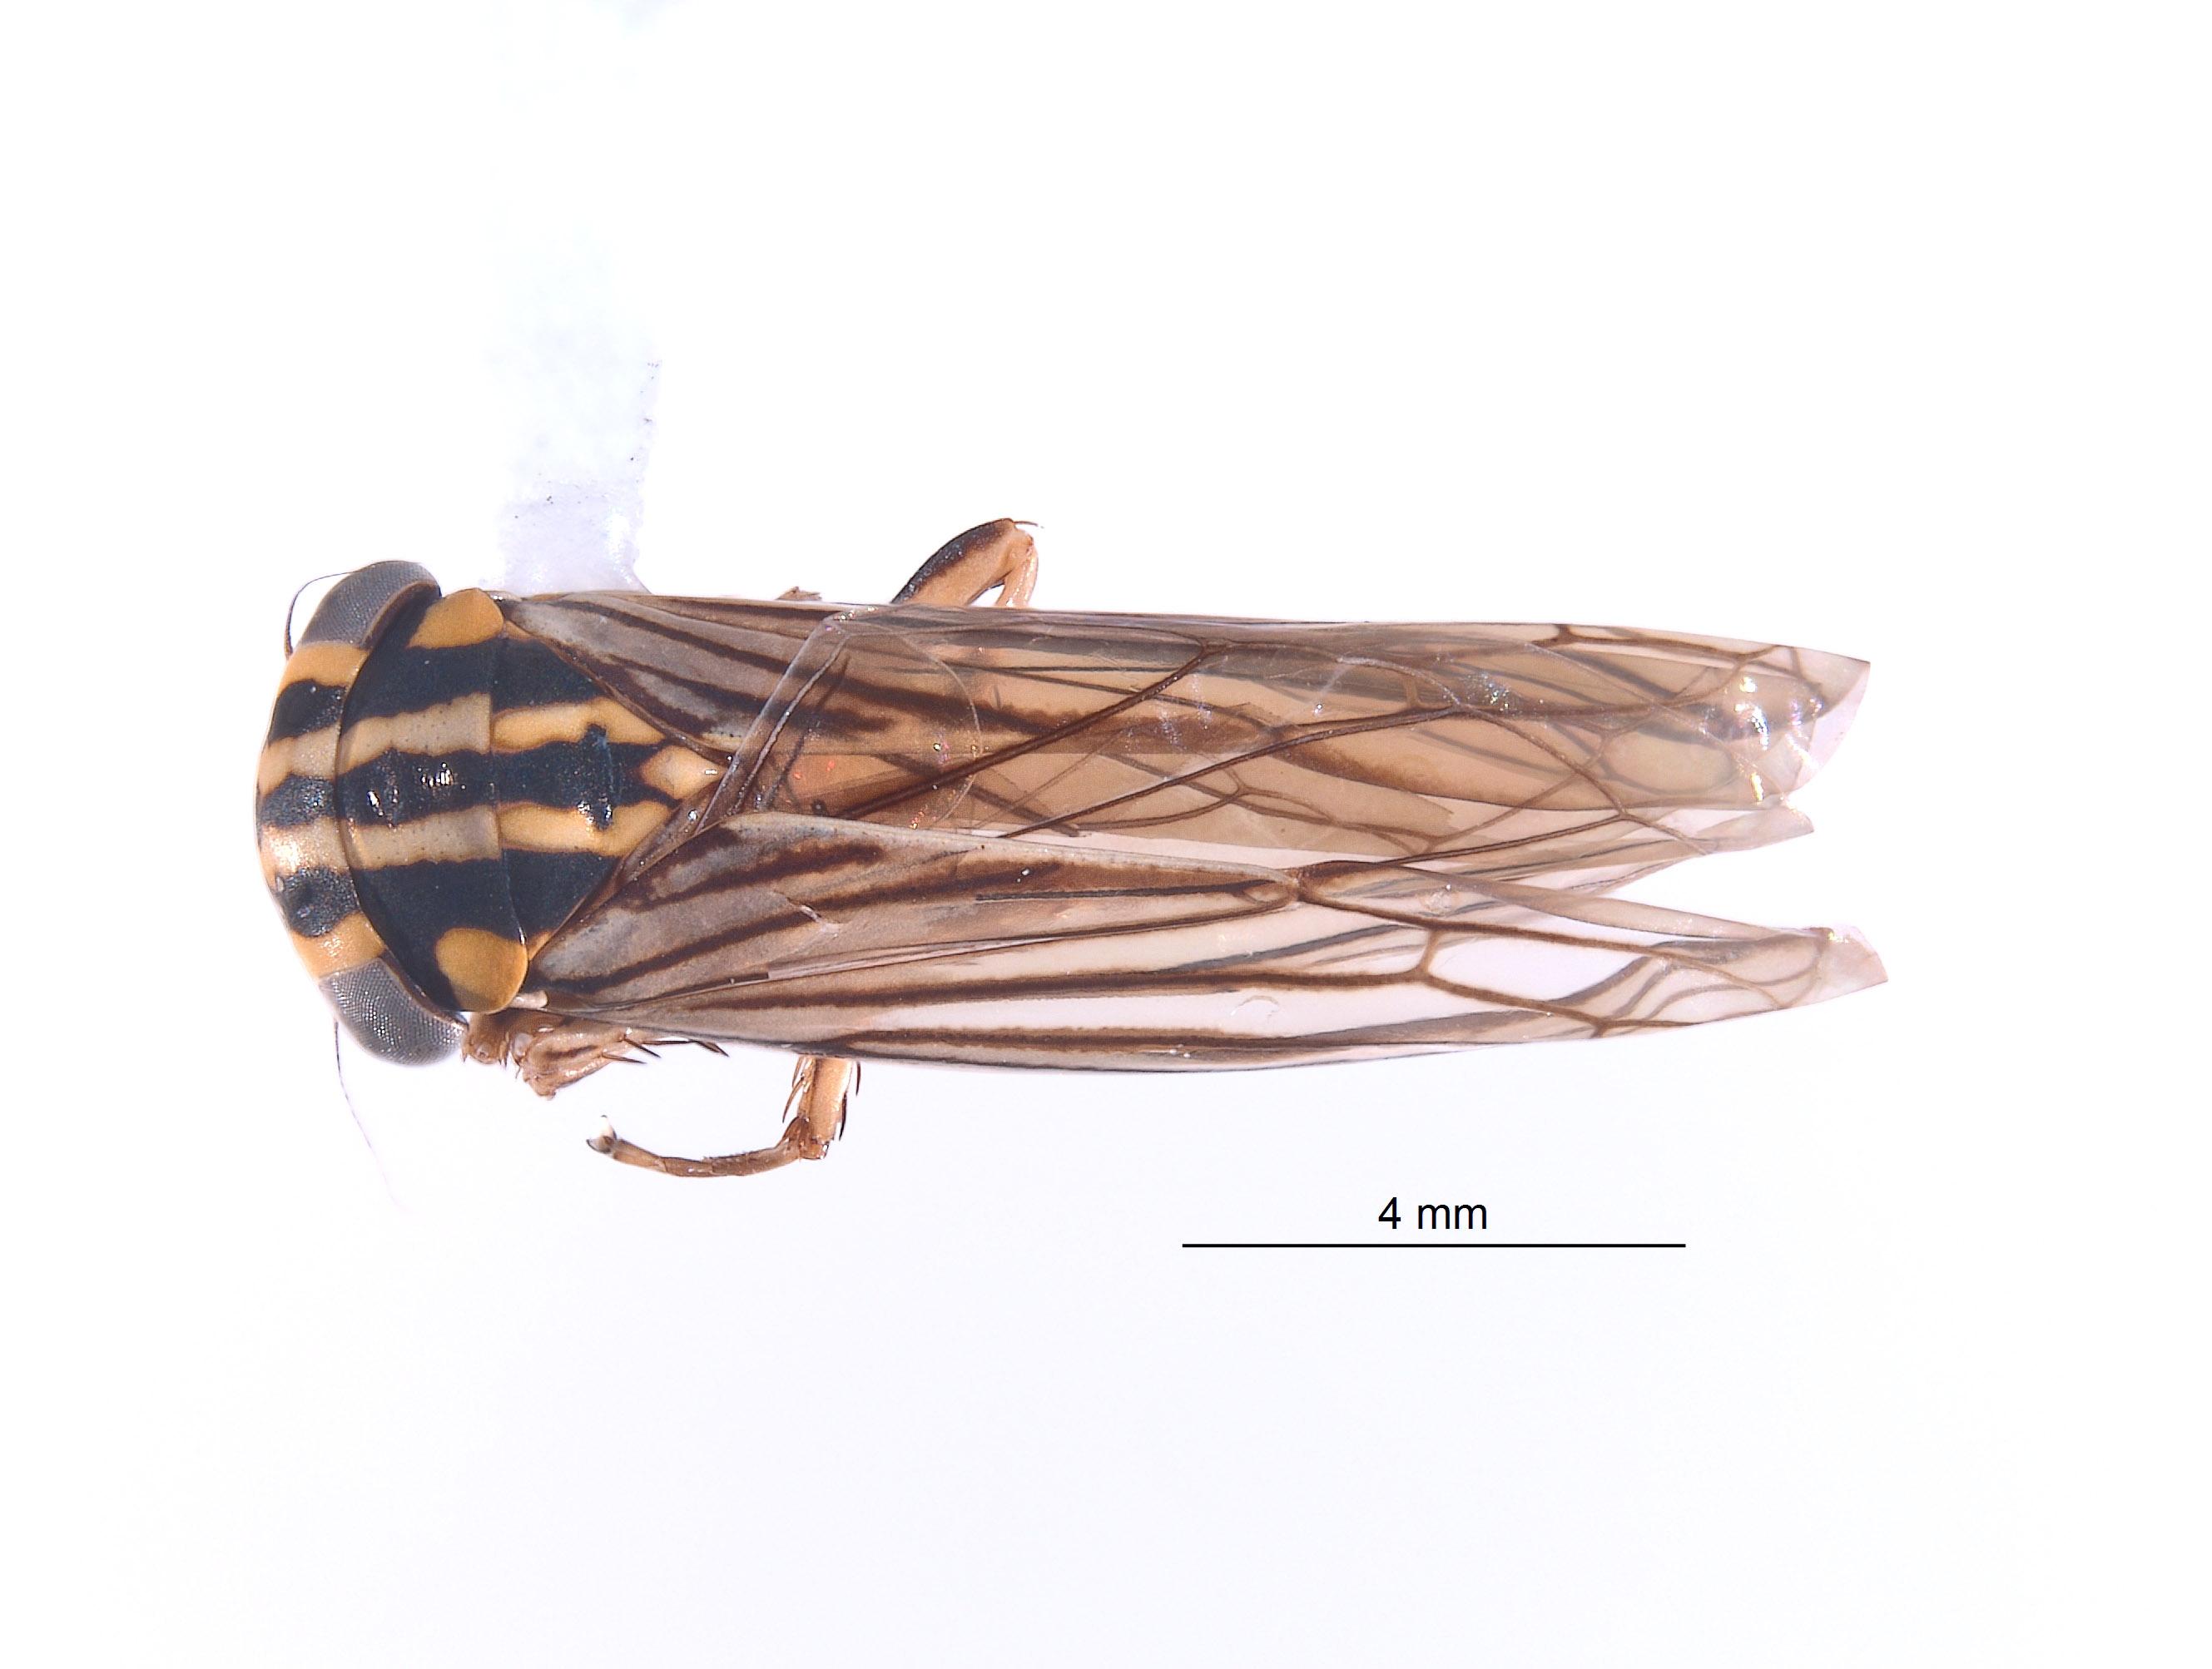 Nesocerus tristriatus image